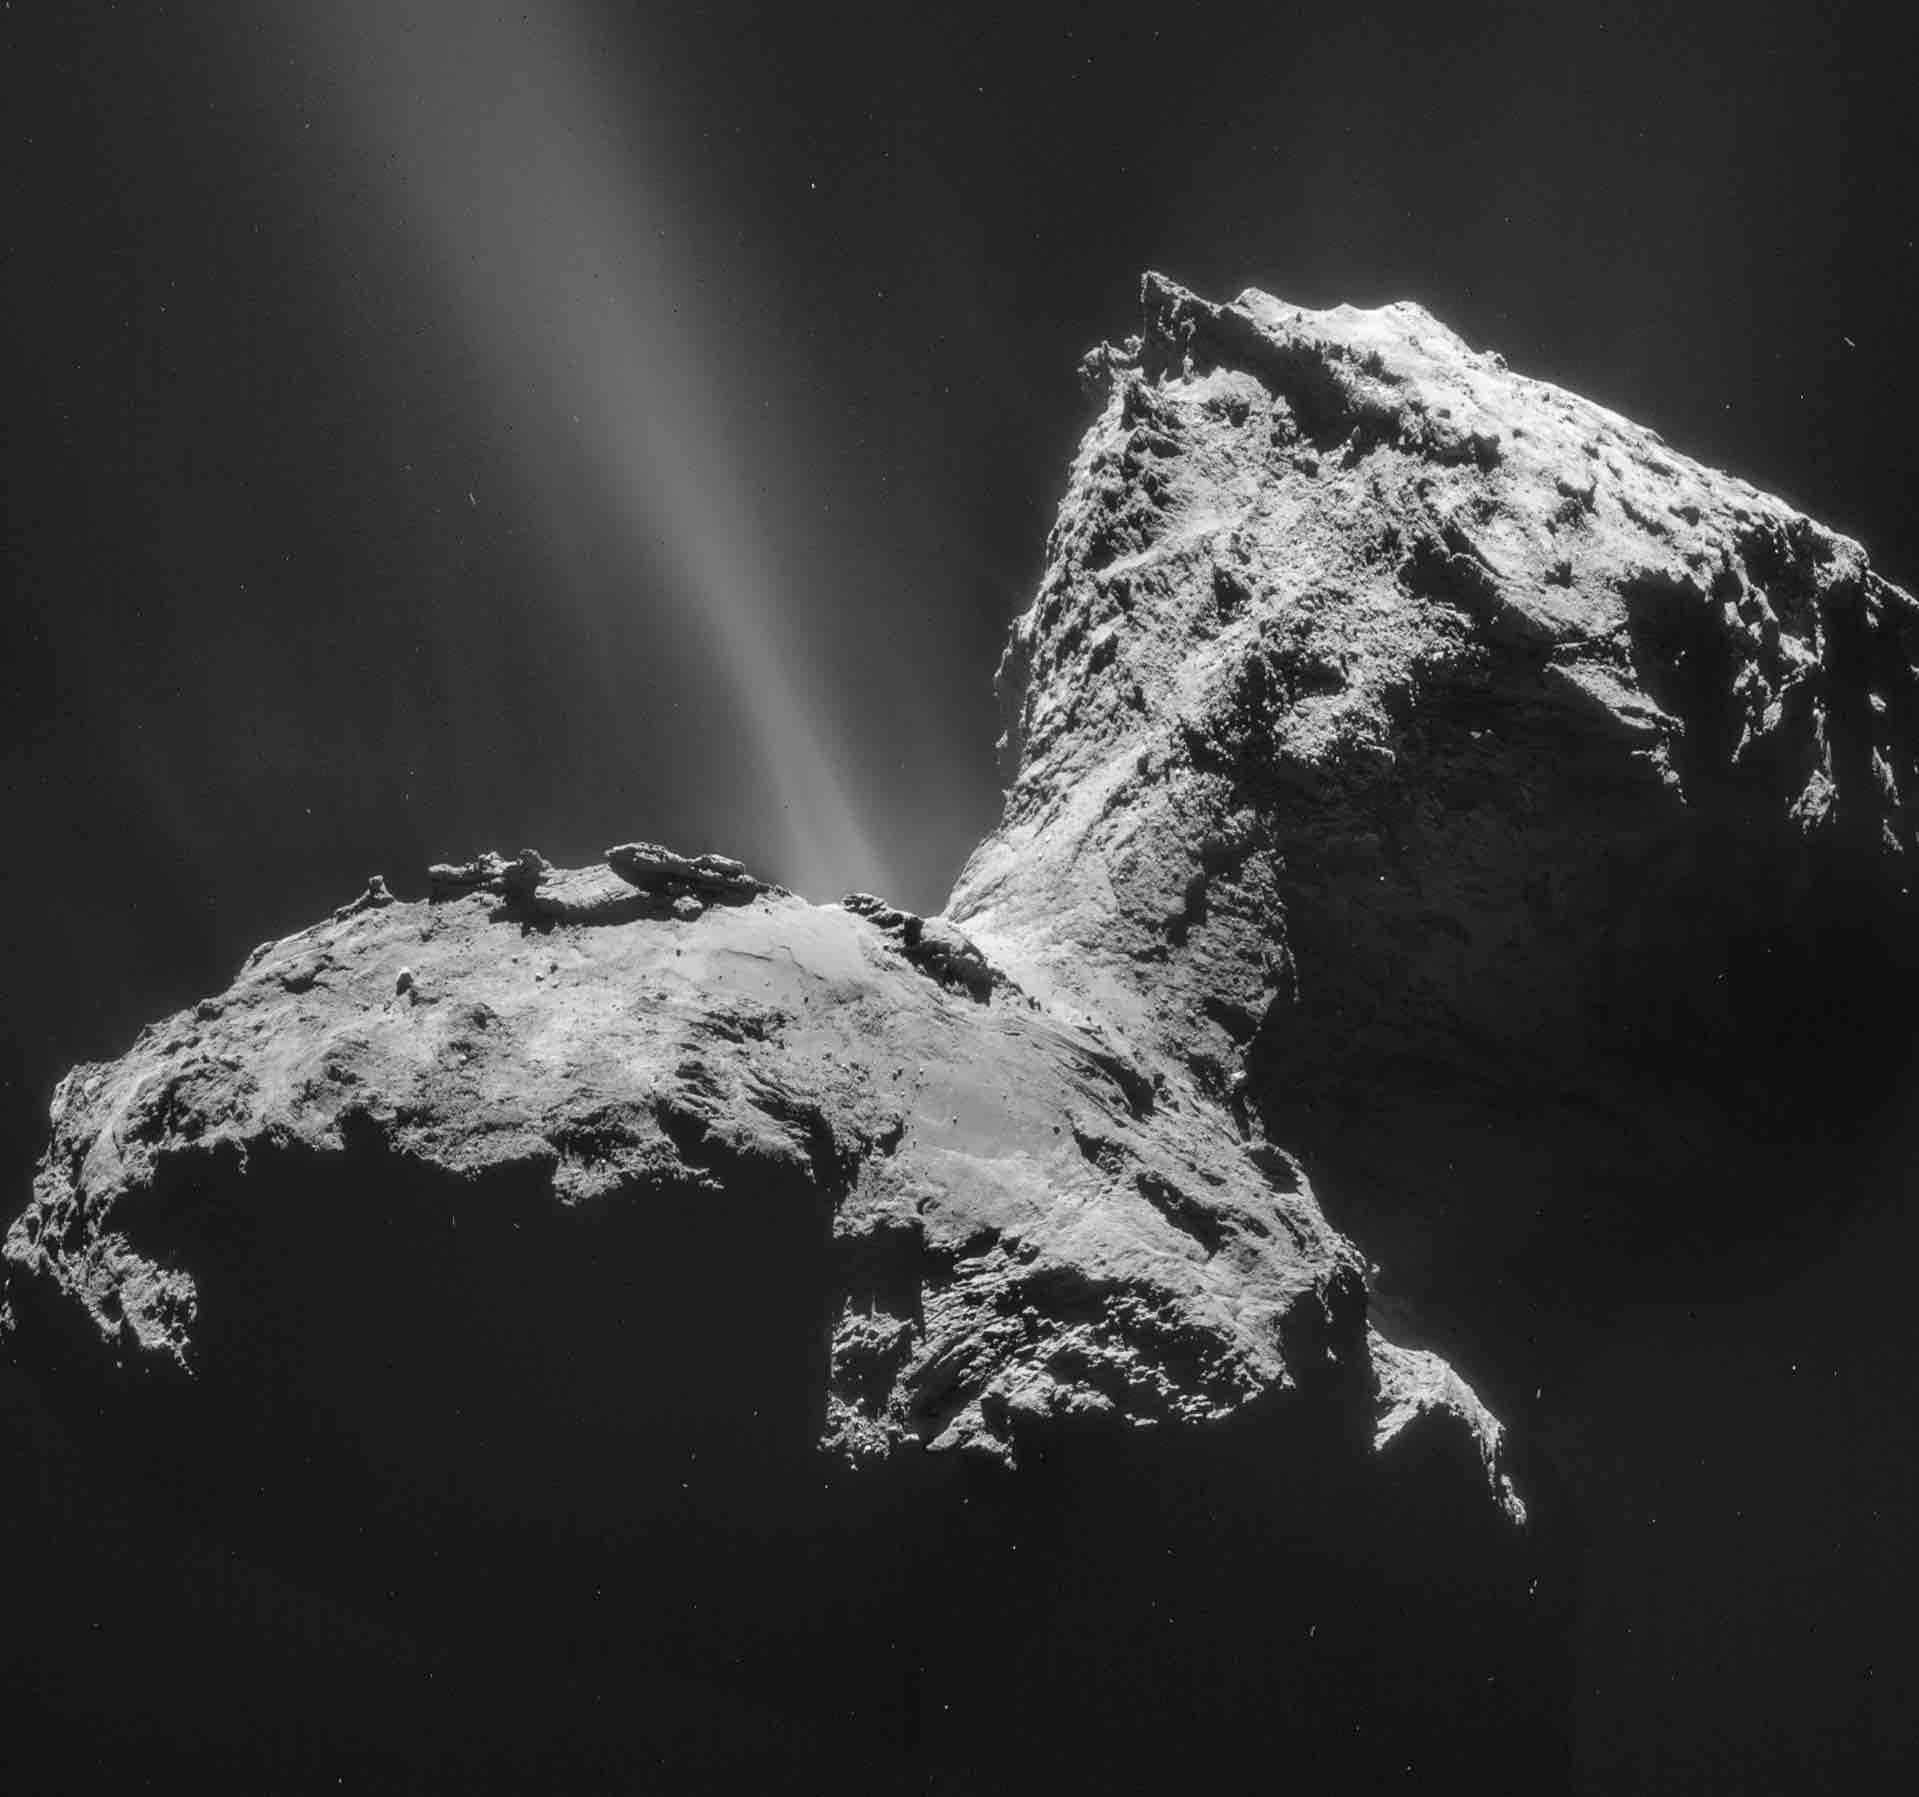 The surface of comet 67P/Churyumov-Gerasimenko photographed by the Rosetta spacecraft